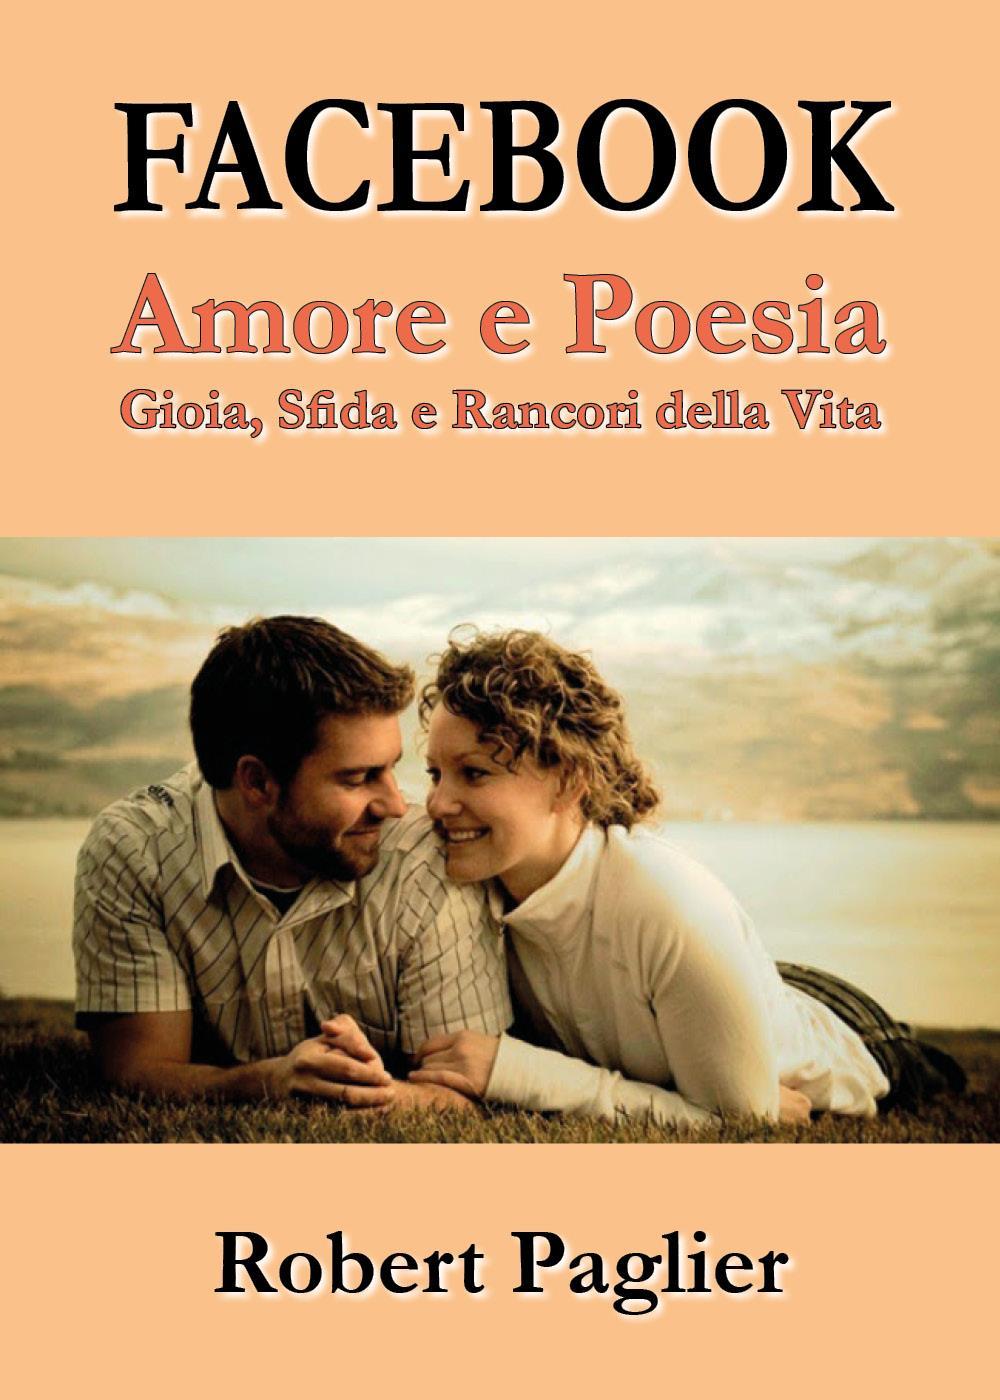 Facebook - Amore e poesia